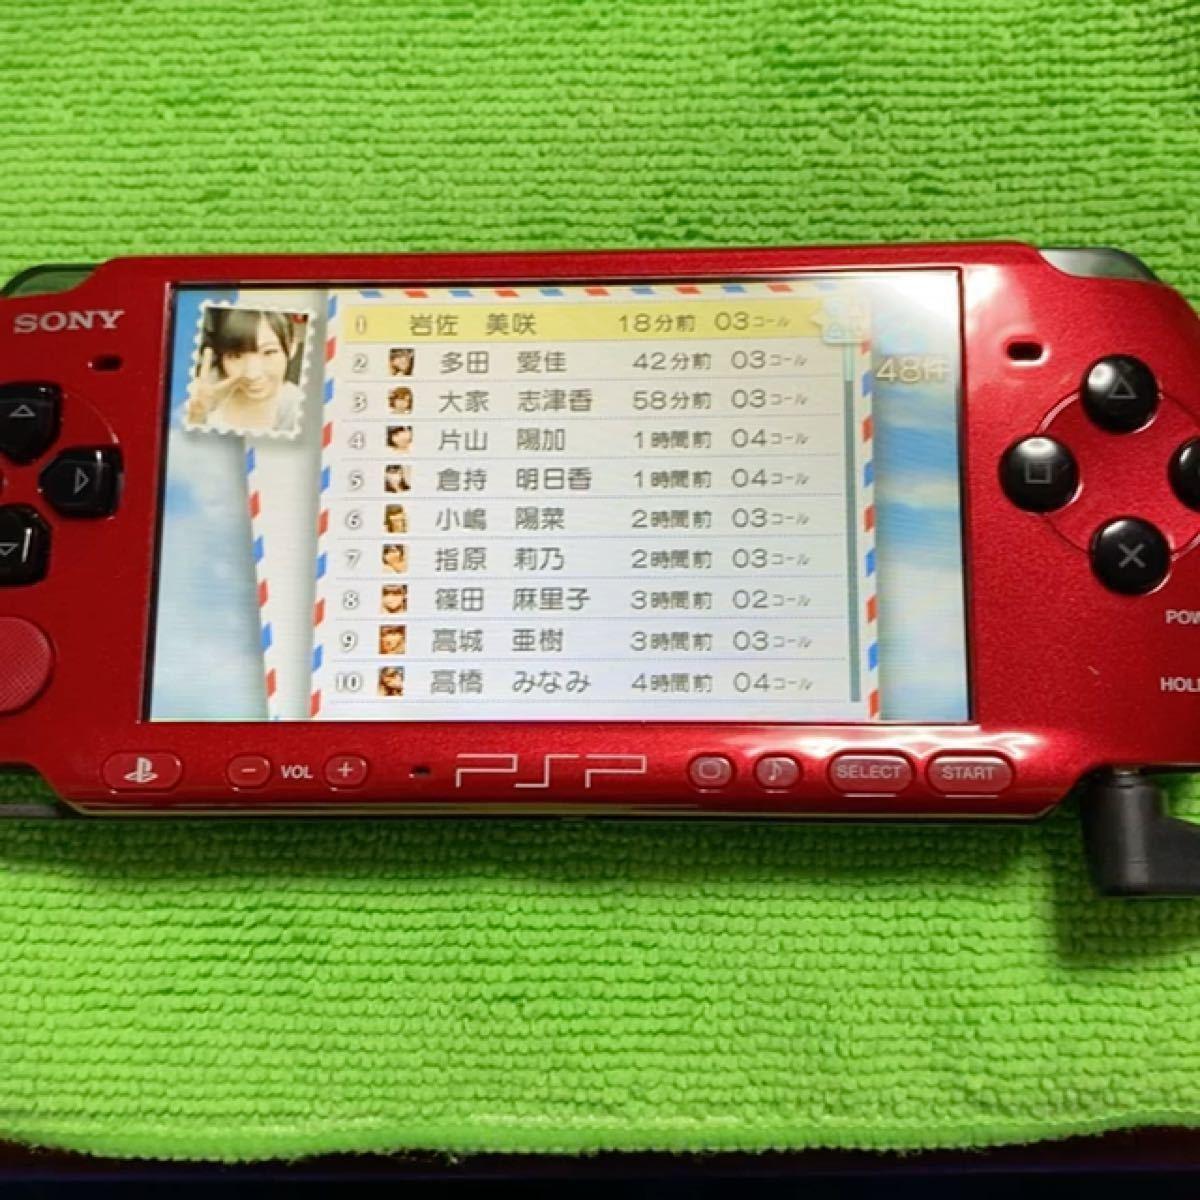 PSP プレイステーション・ポータブル PSP-3000 バリューパック レッド/ブラック美品 & おまけでソフト2本